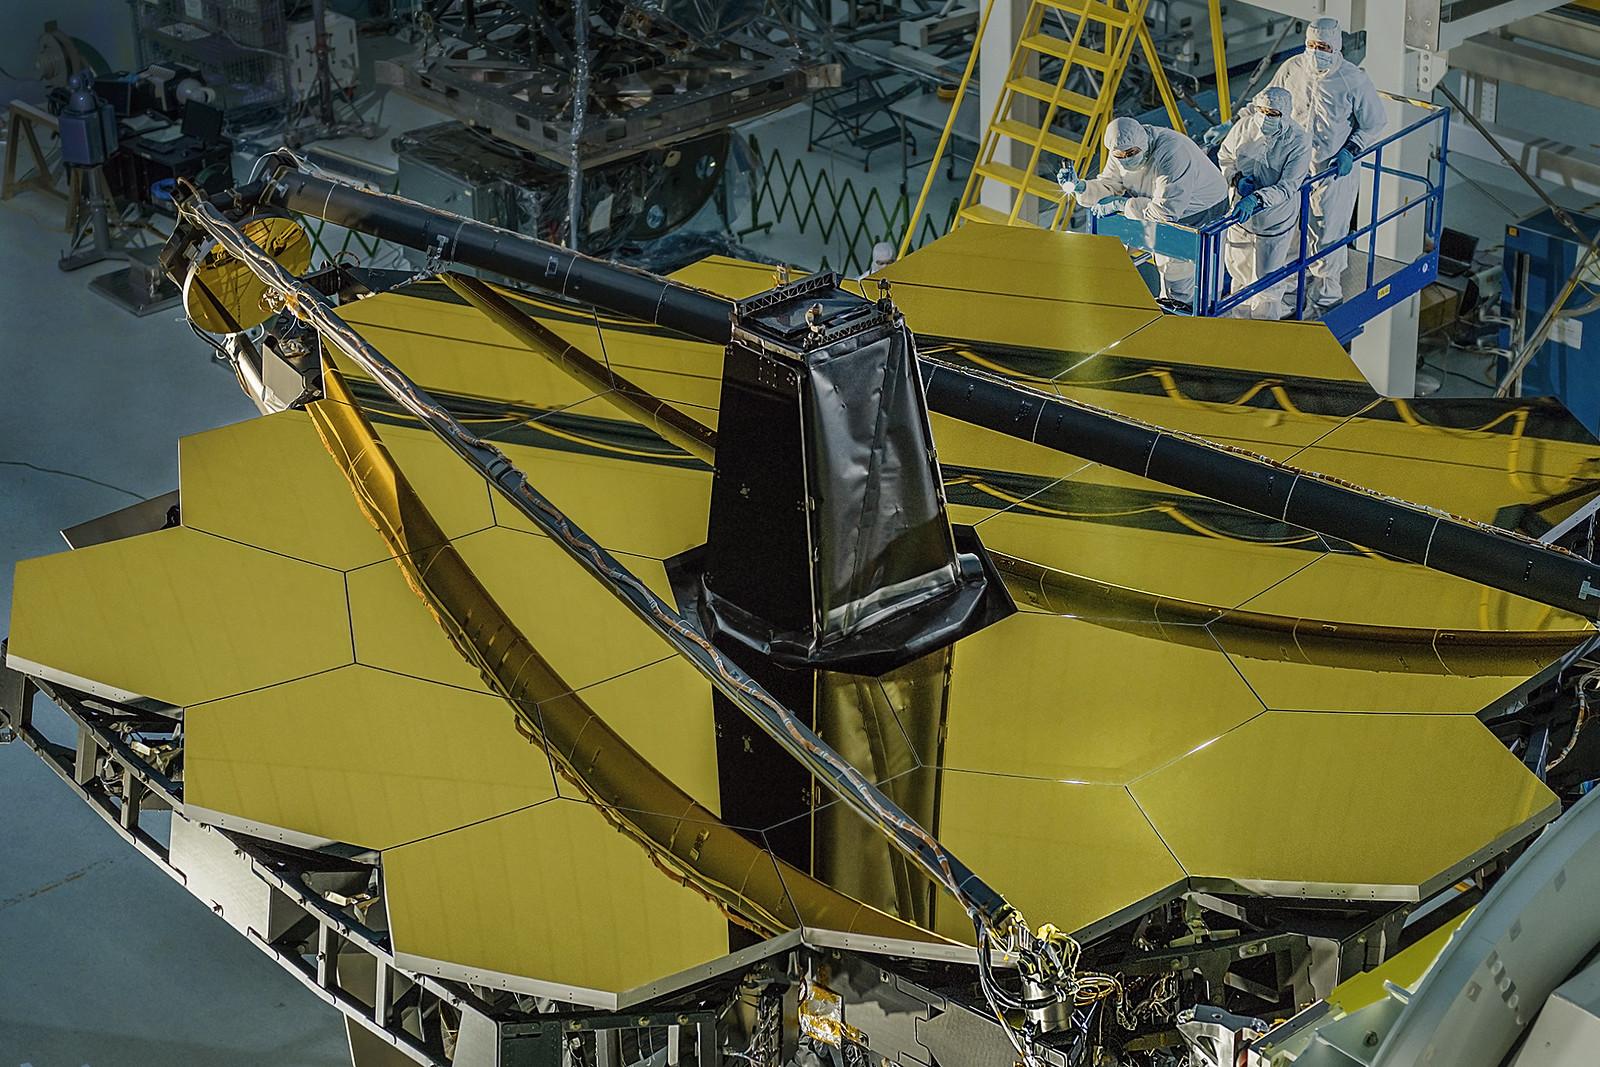 Вселенная, у нас проблемы. «Хаббл» уже не работает, а «Джеймс Уэбб» еще не запущен - 1